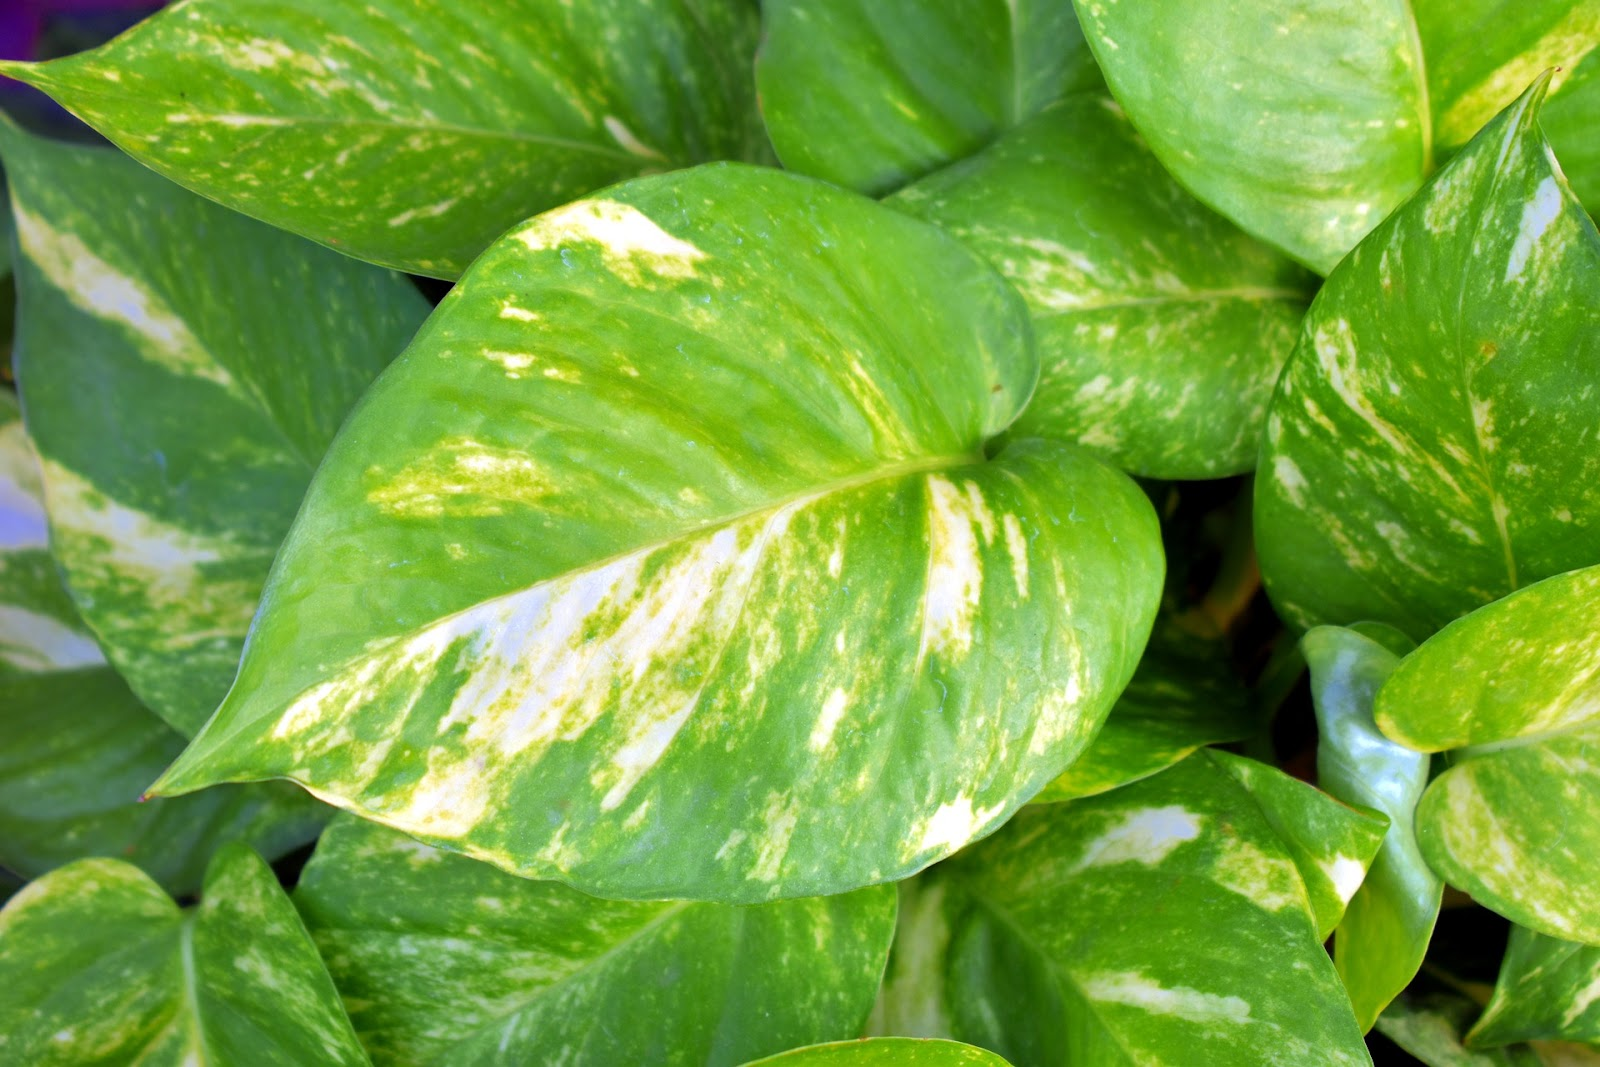 Devil's ivy money plant